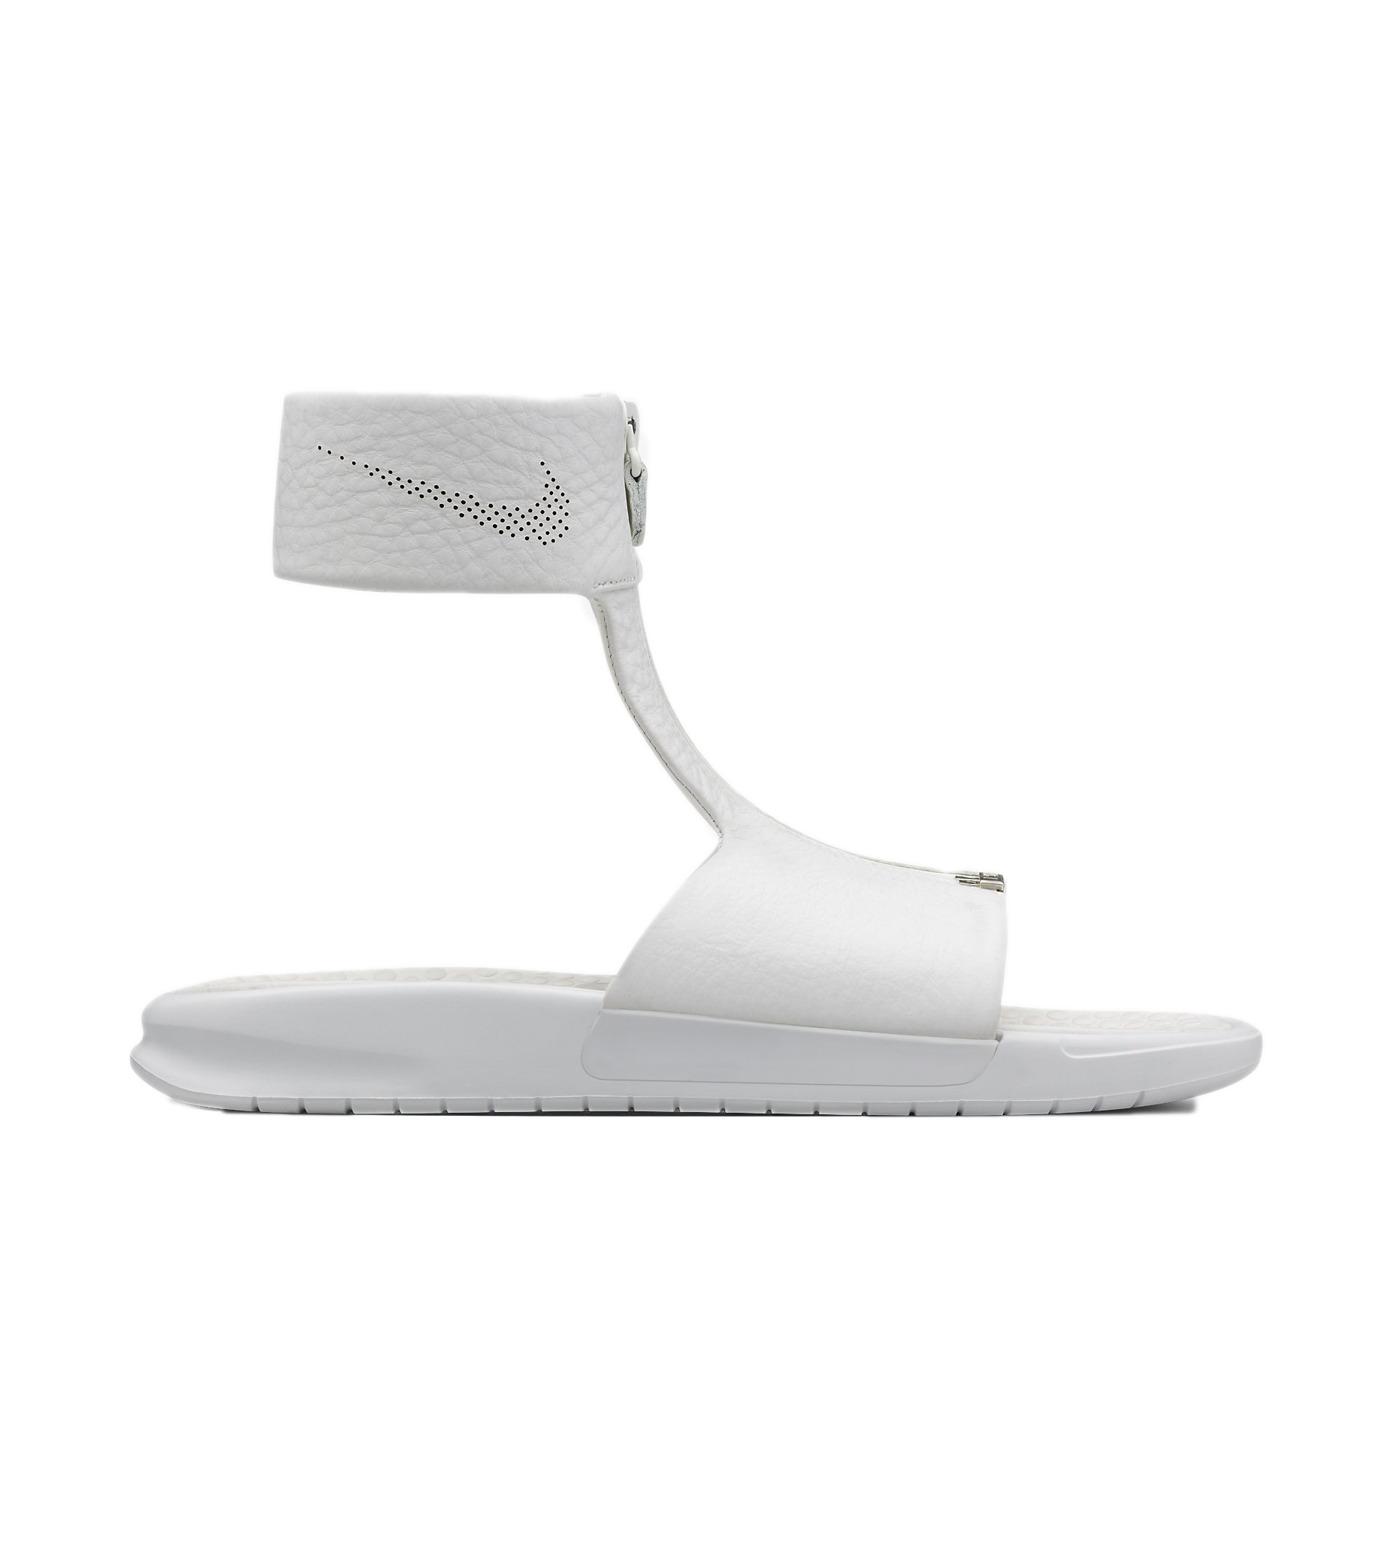 NIKE(ナイキ)のBenassi CUFF-WHITE(シューズ/shoes)-819684-100-4 拡大詳細画像1